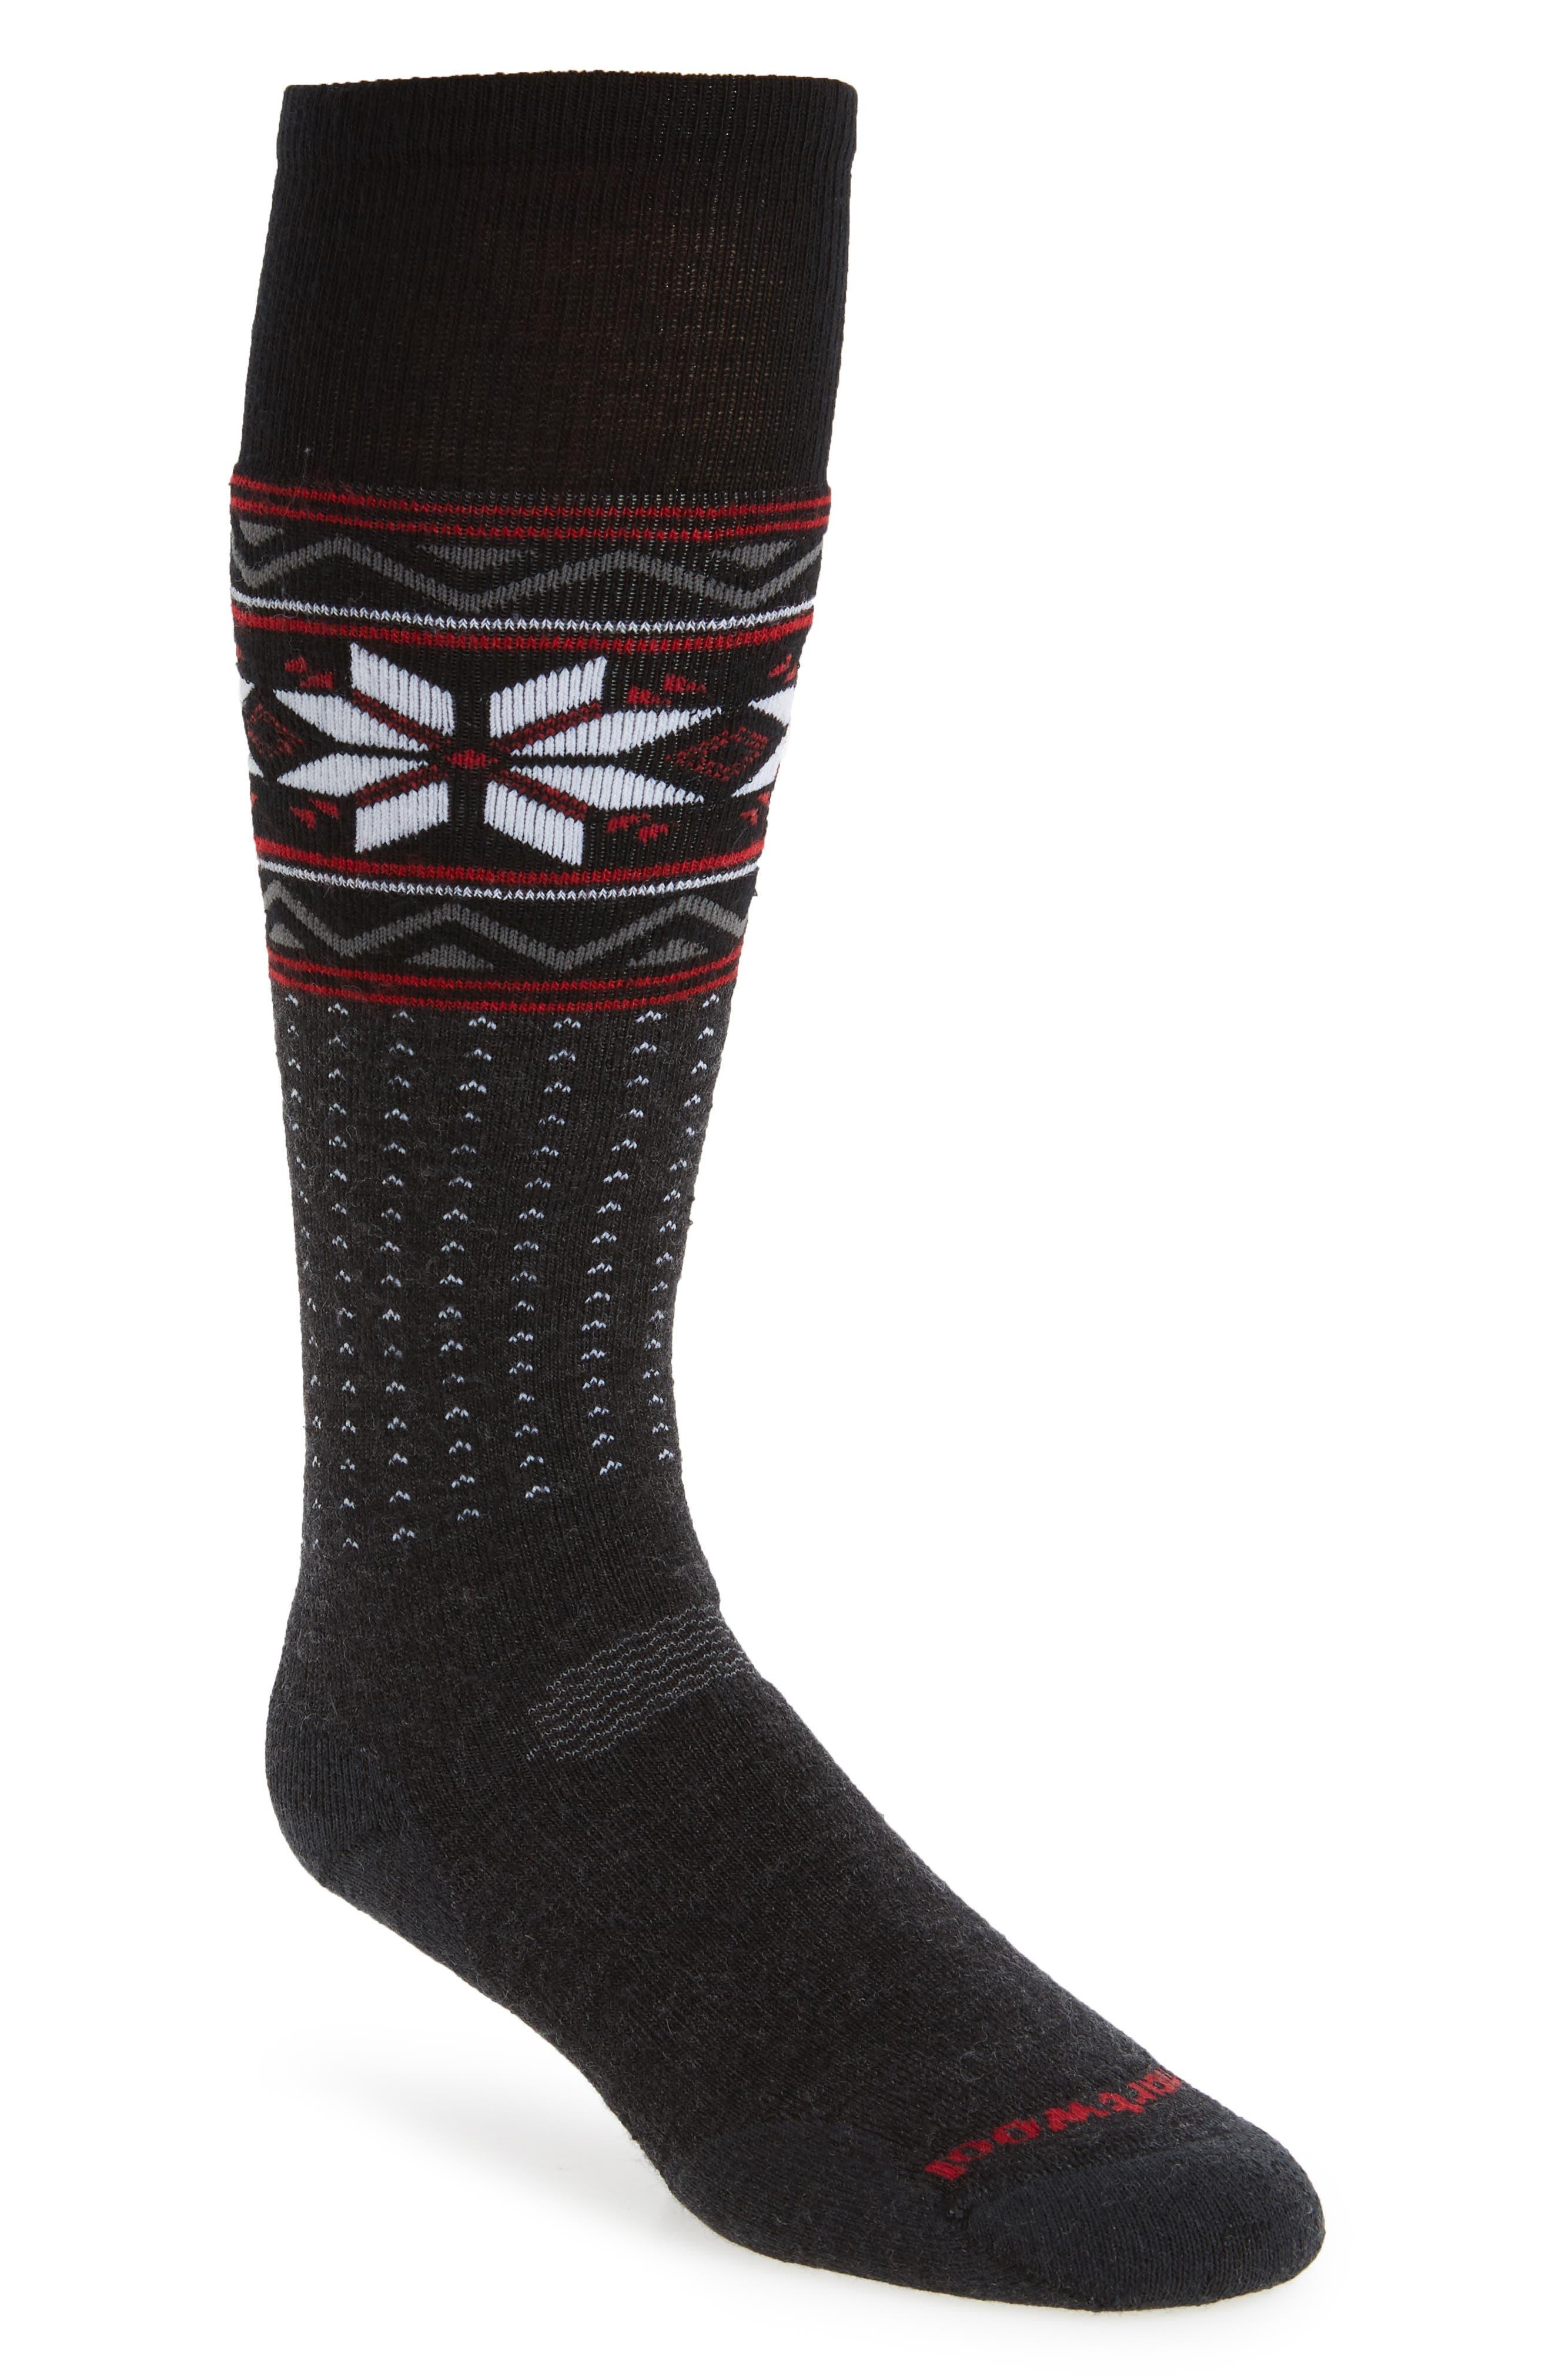 Main Image - Smartwool PhD Slopestyle Socks